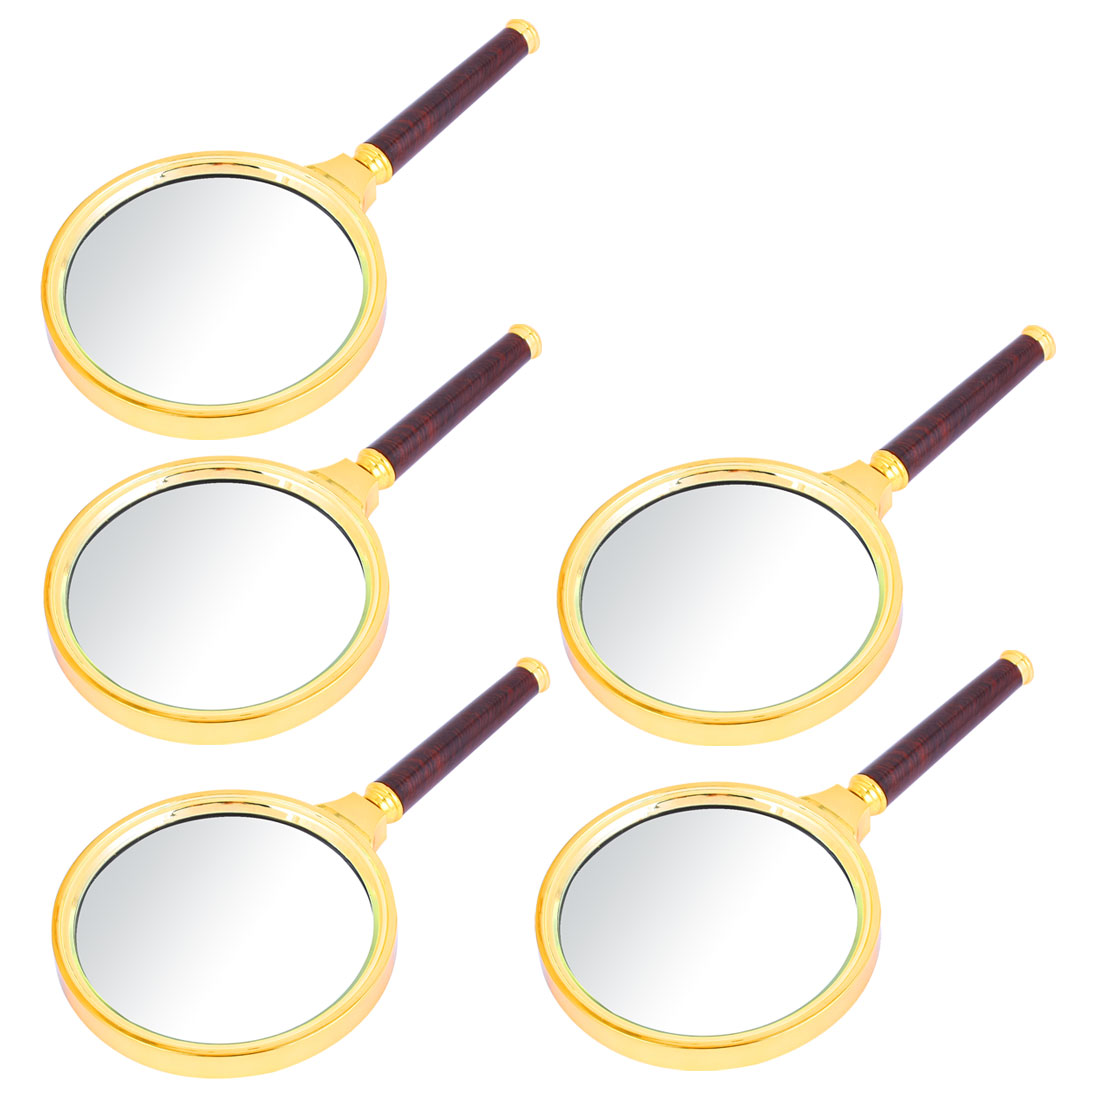 5PCS Detachable Wooden Handle 90mm Dia Magnifying Glass Magnifier Gold Tone 10X